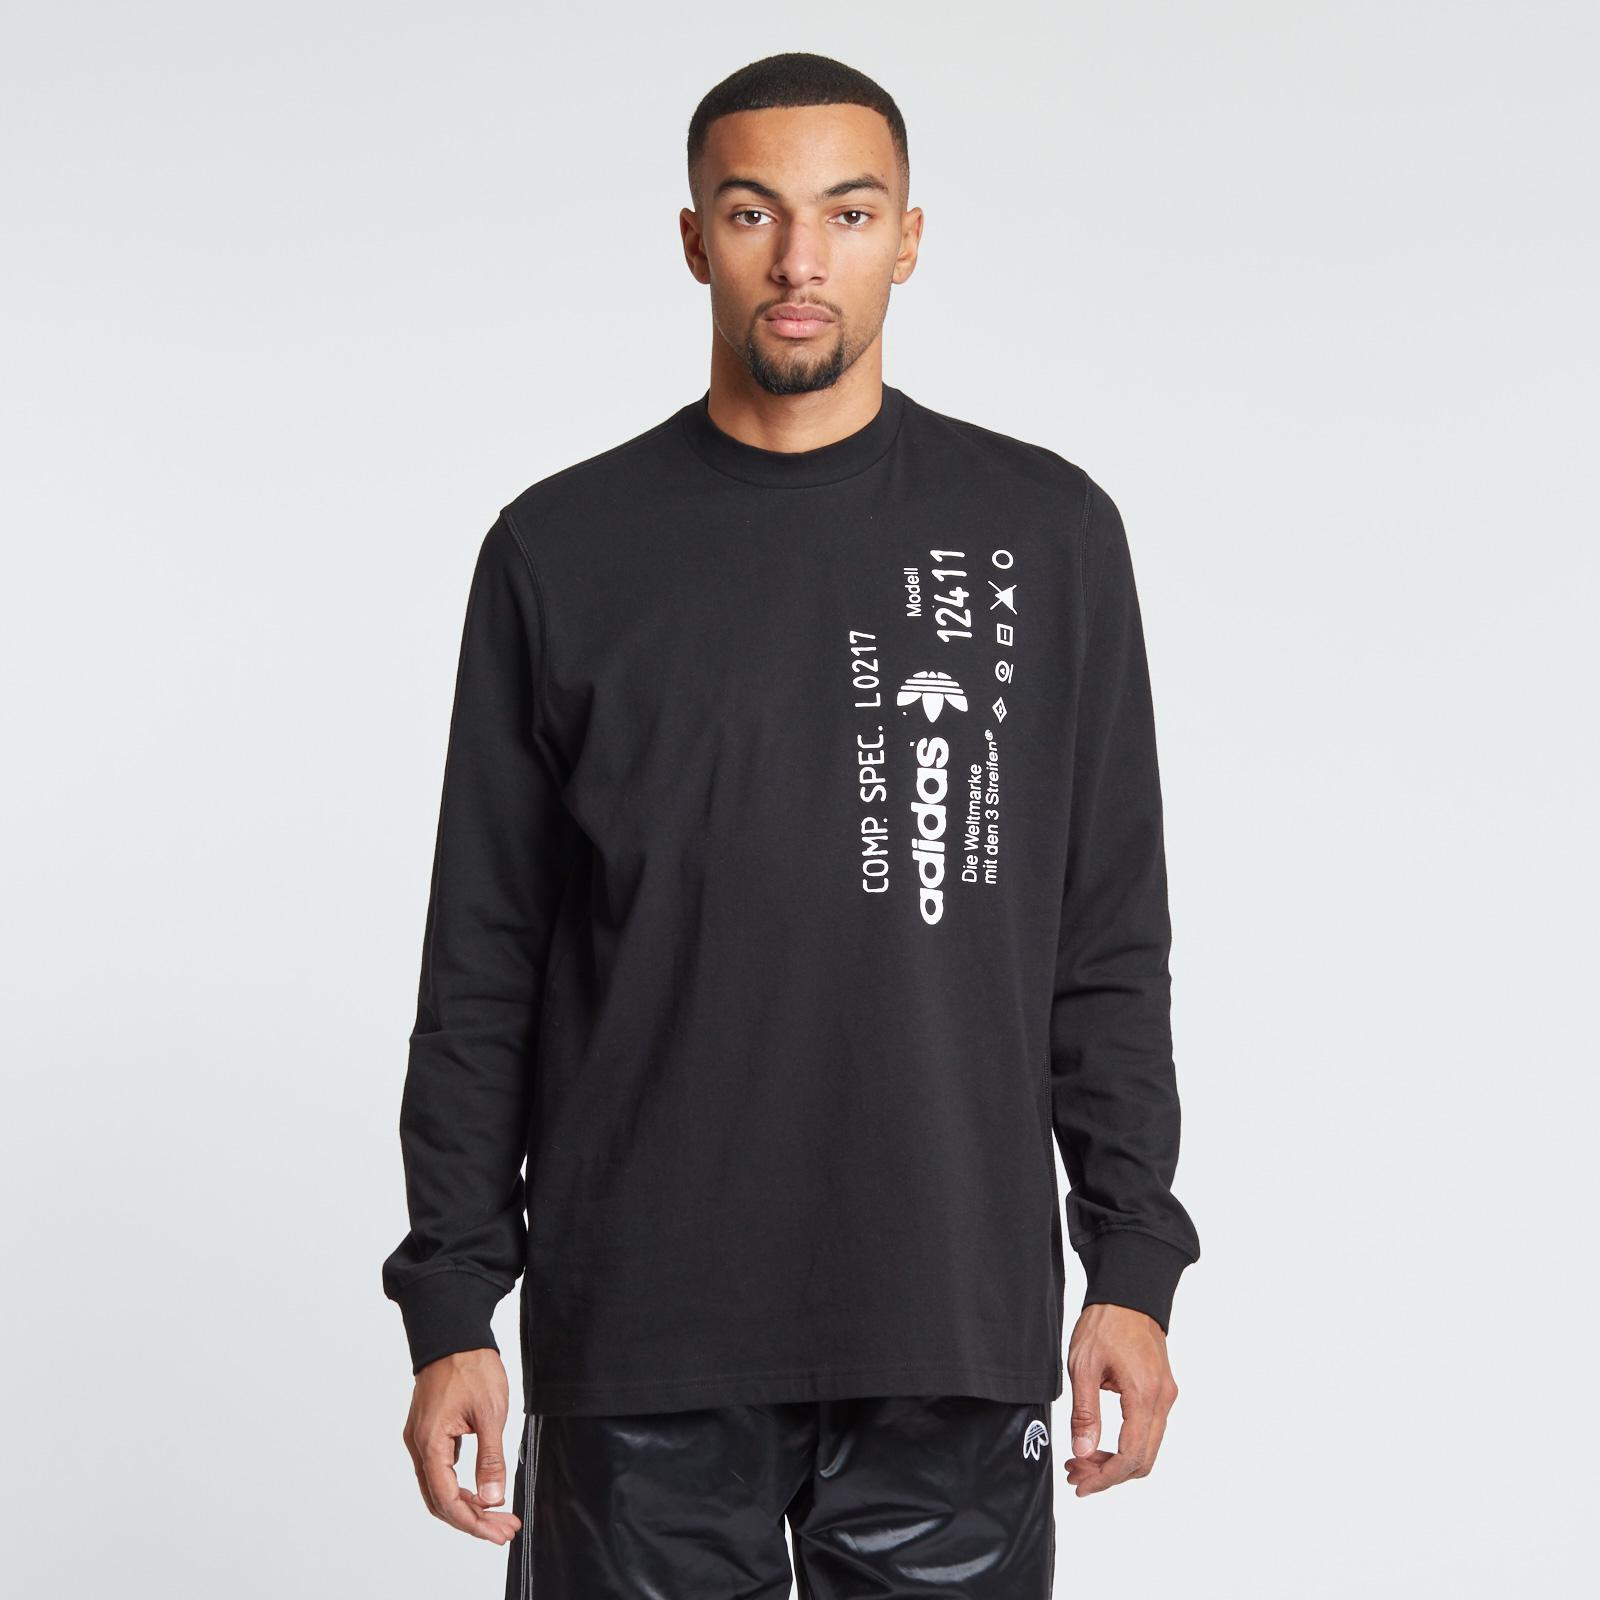 e161bd86b212 adidas Graphic Long Sleeve Shirt - Cv5290 - Sneakersnstuff ...